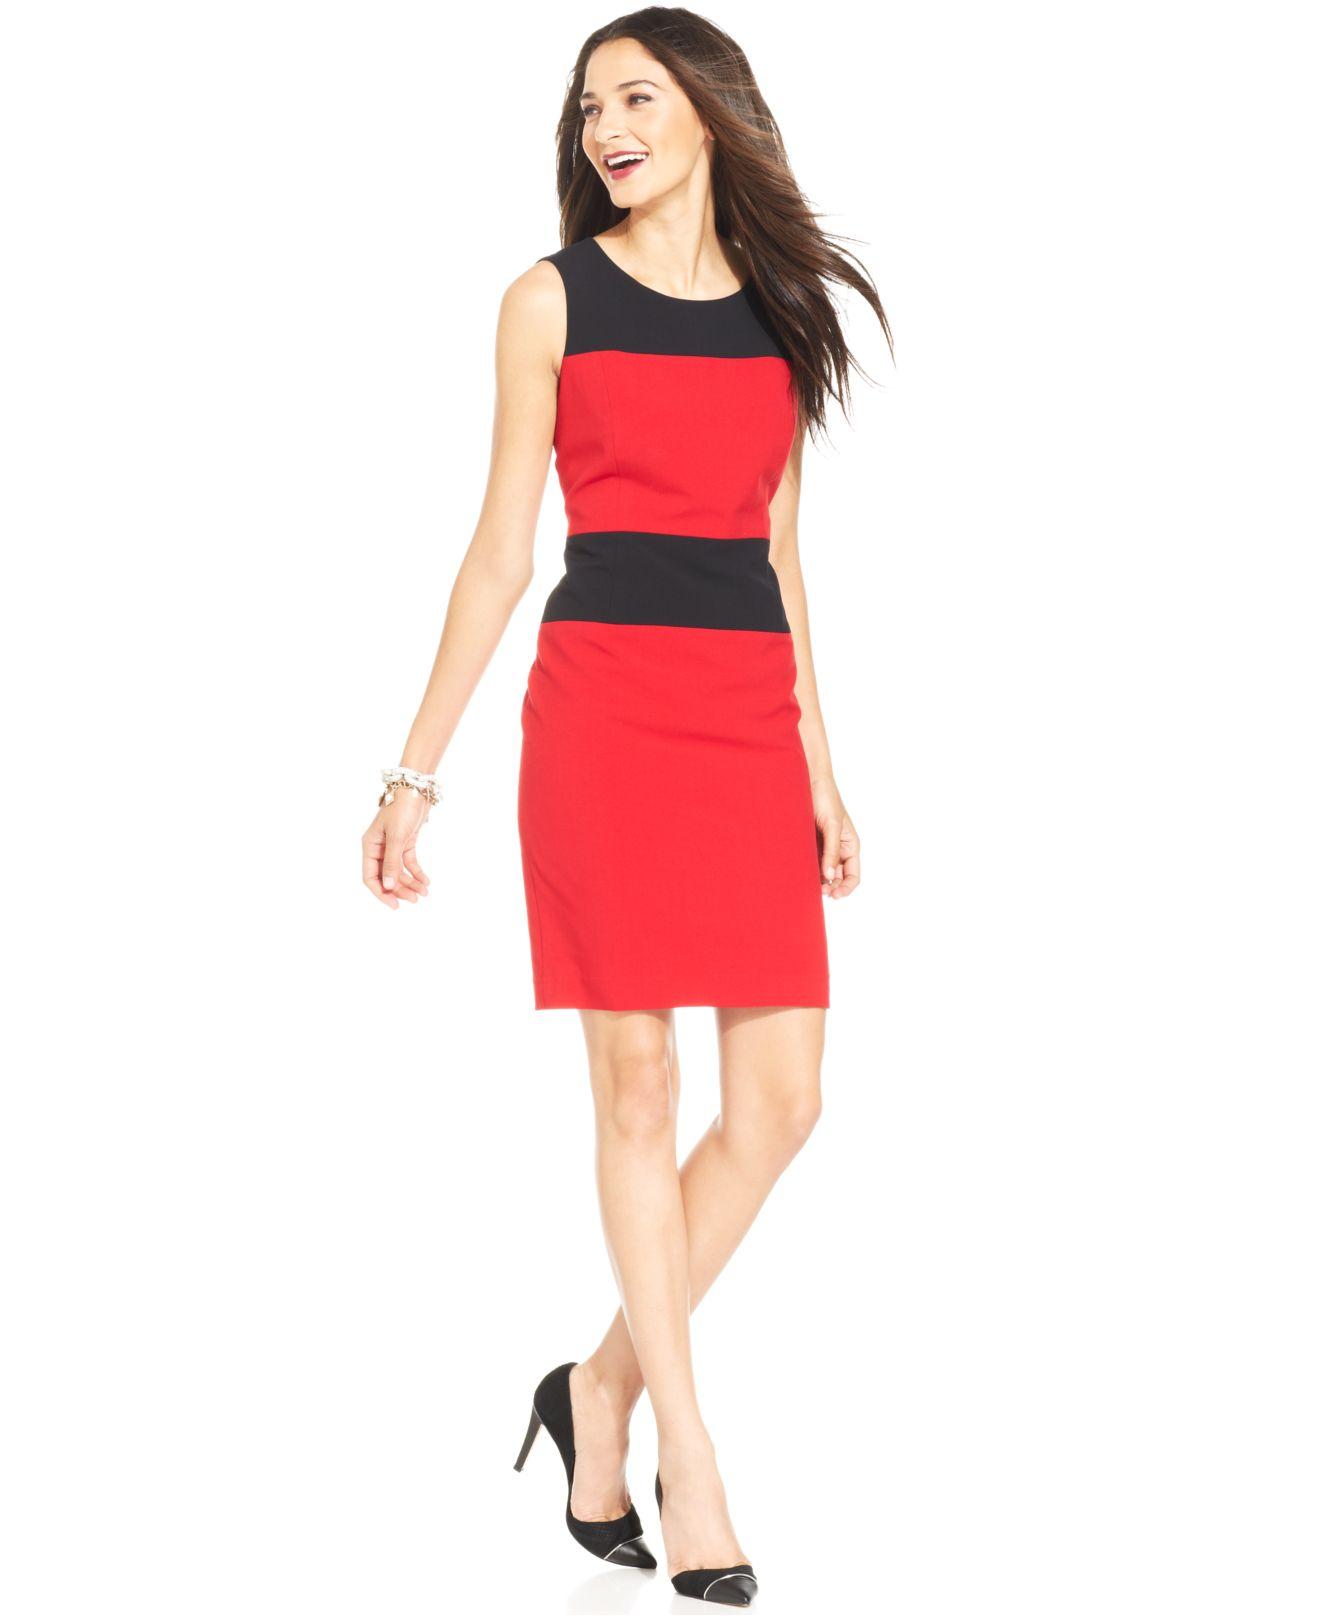 eddefffd Nine West Sleeveless Colorblock Sheath Dress in Red - Lyst